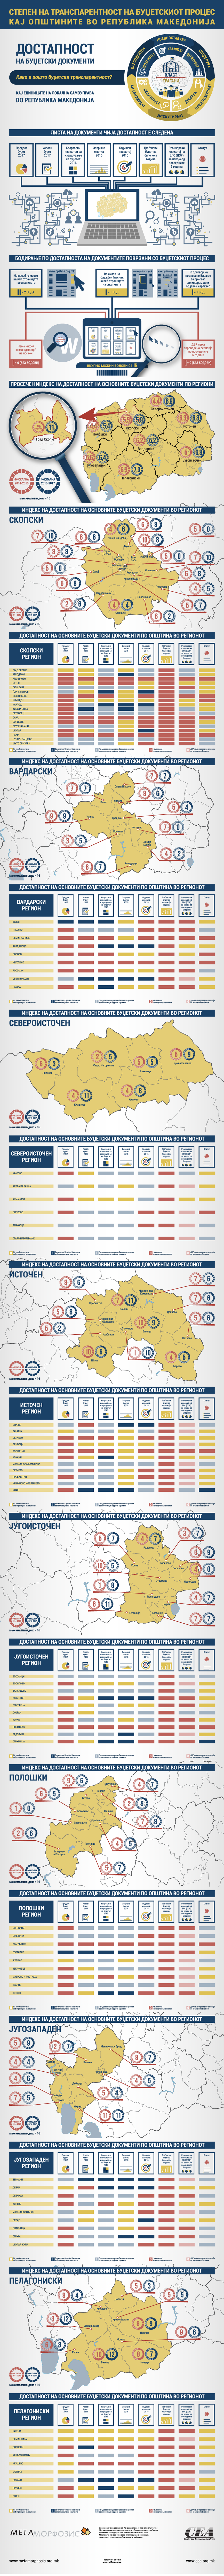 Infographic_Budzetska-transparentnost_web_NEW